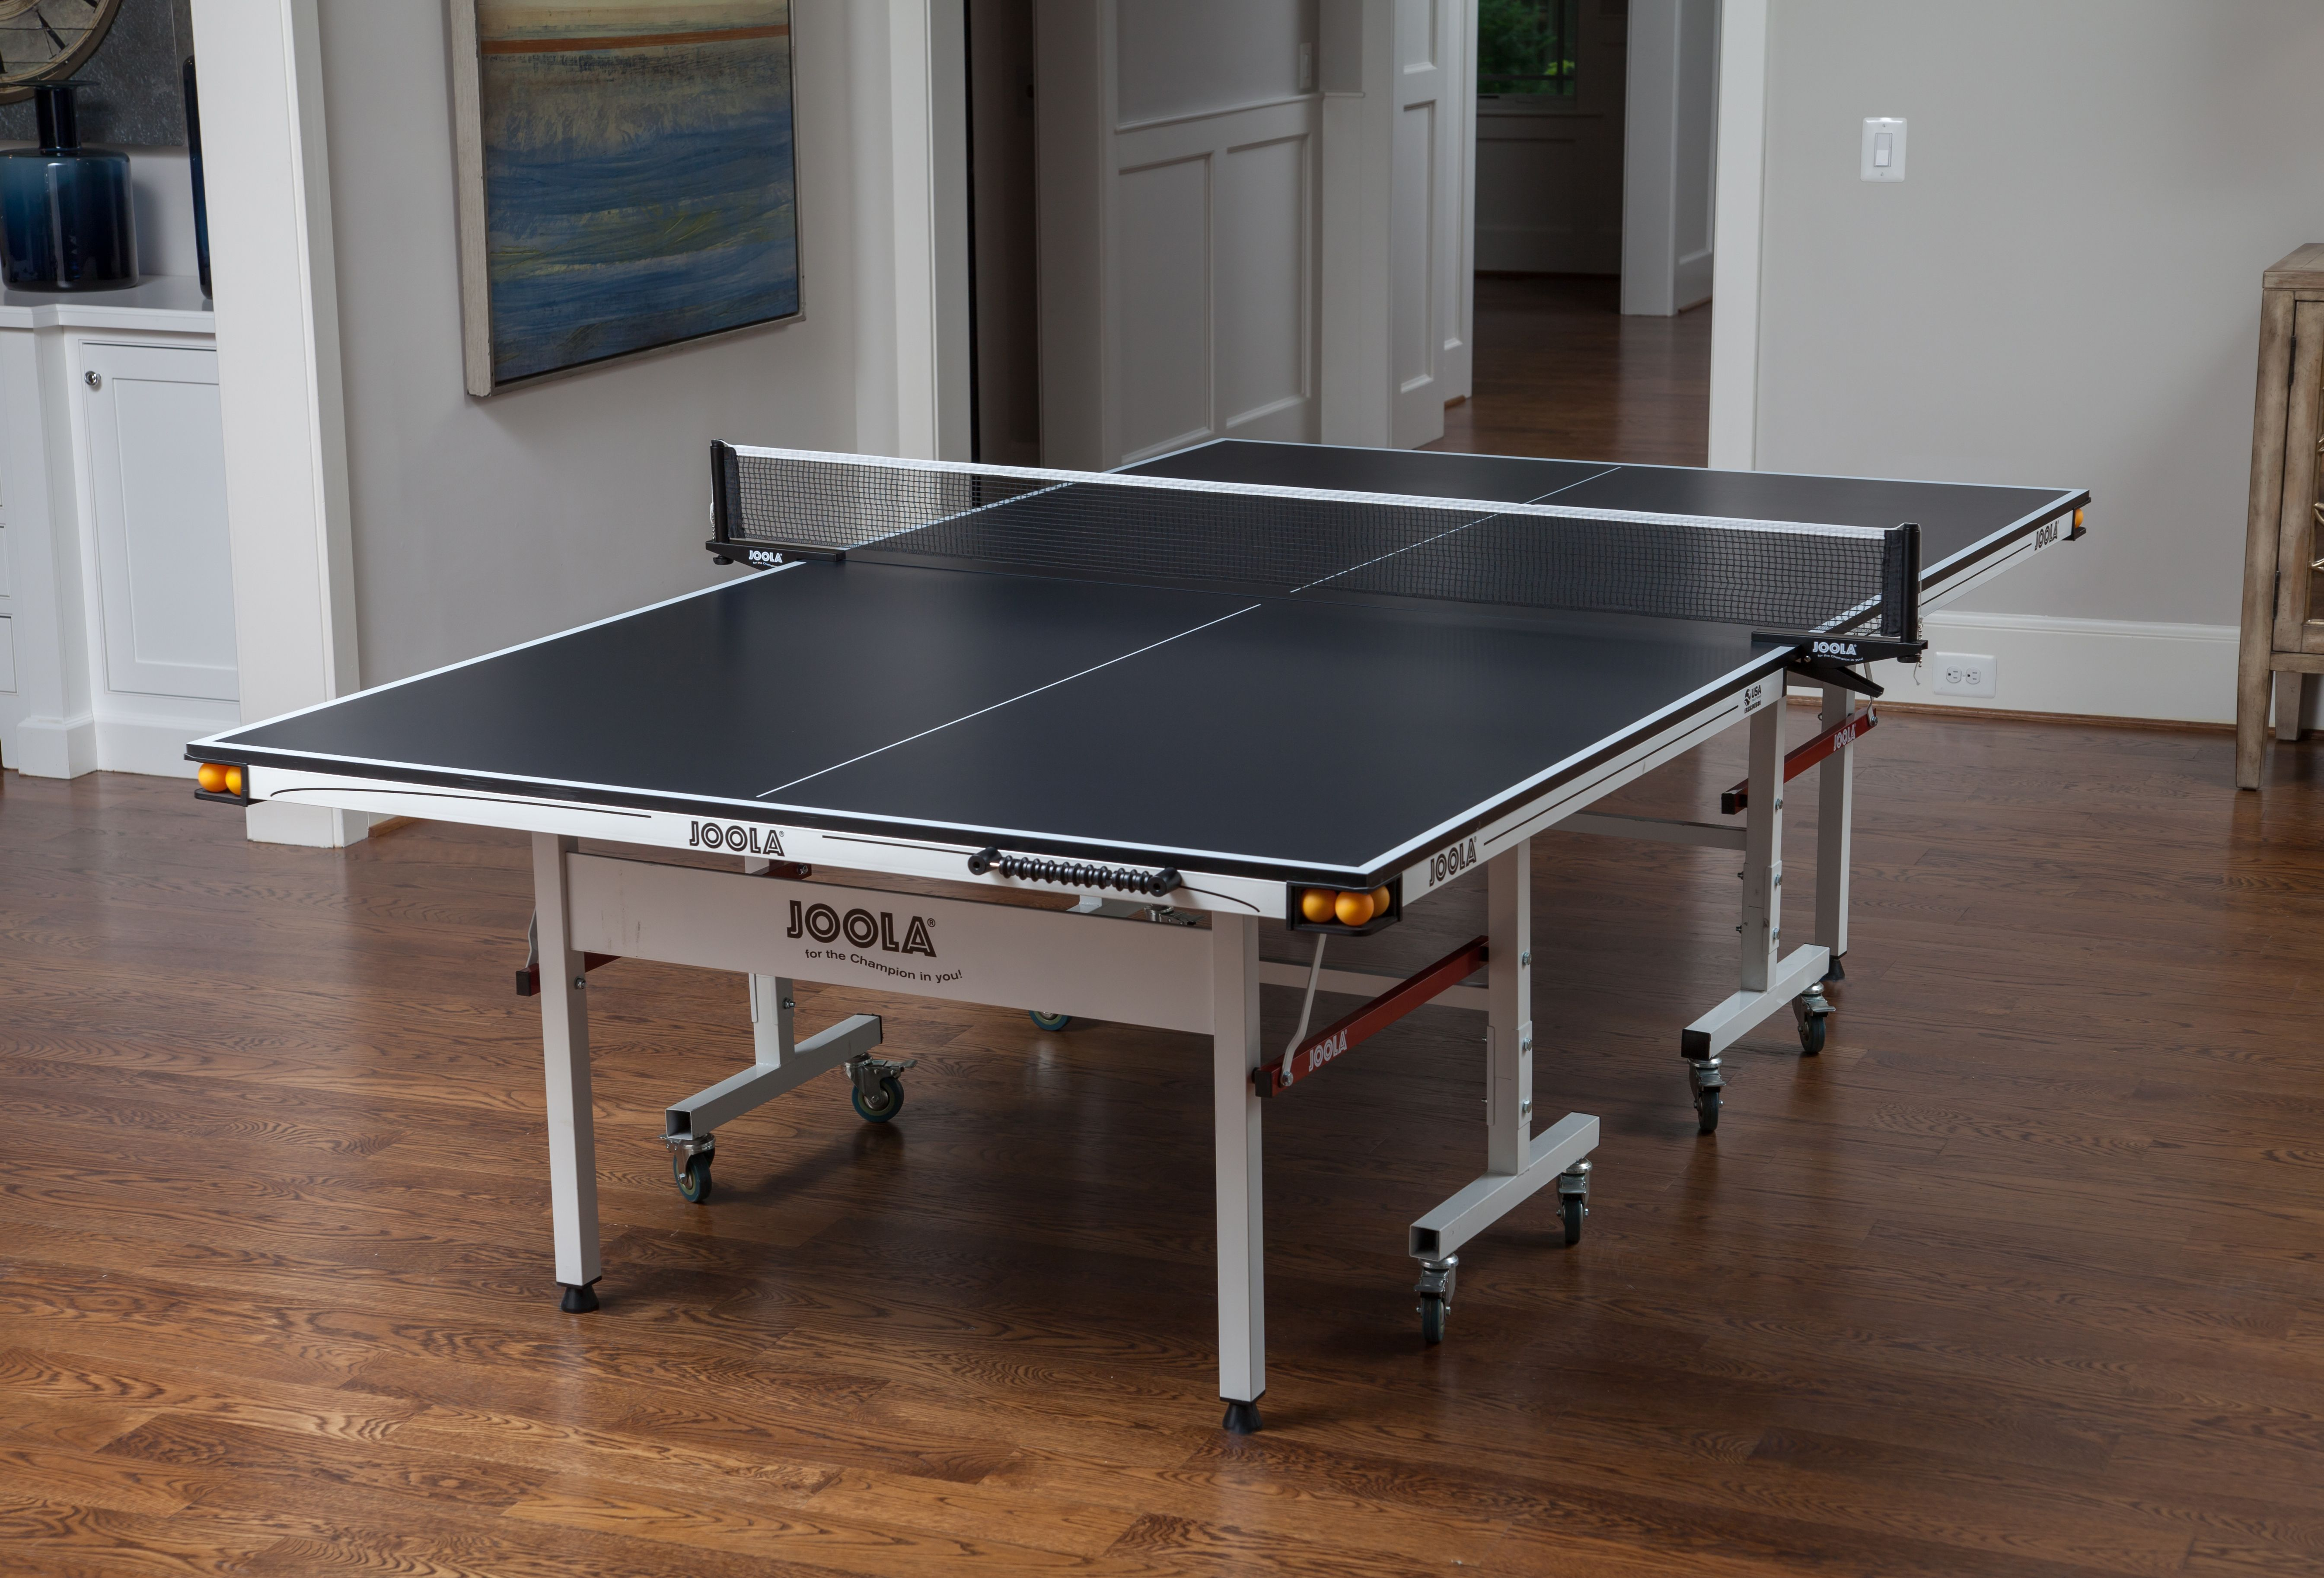 Joola Rapid Play 180 Table Tennis Table 18mm Joola Outdoor Table Tennis Table Table Tennis Ping Pong Table